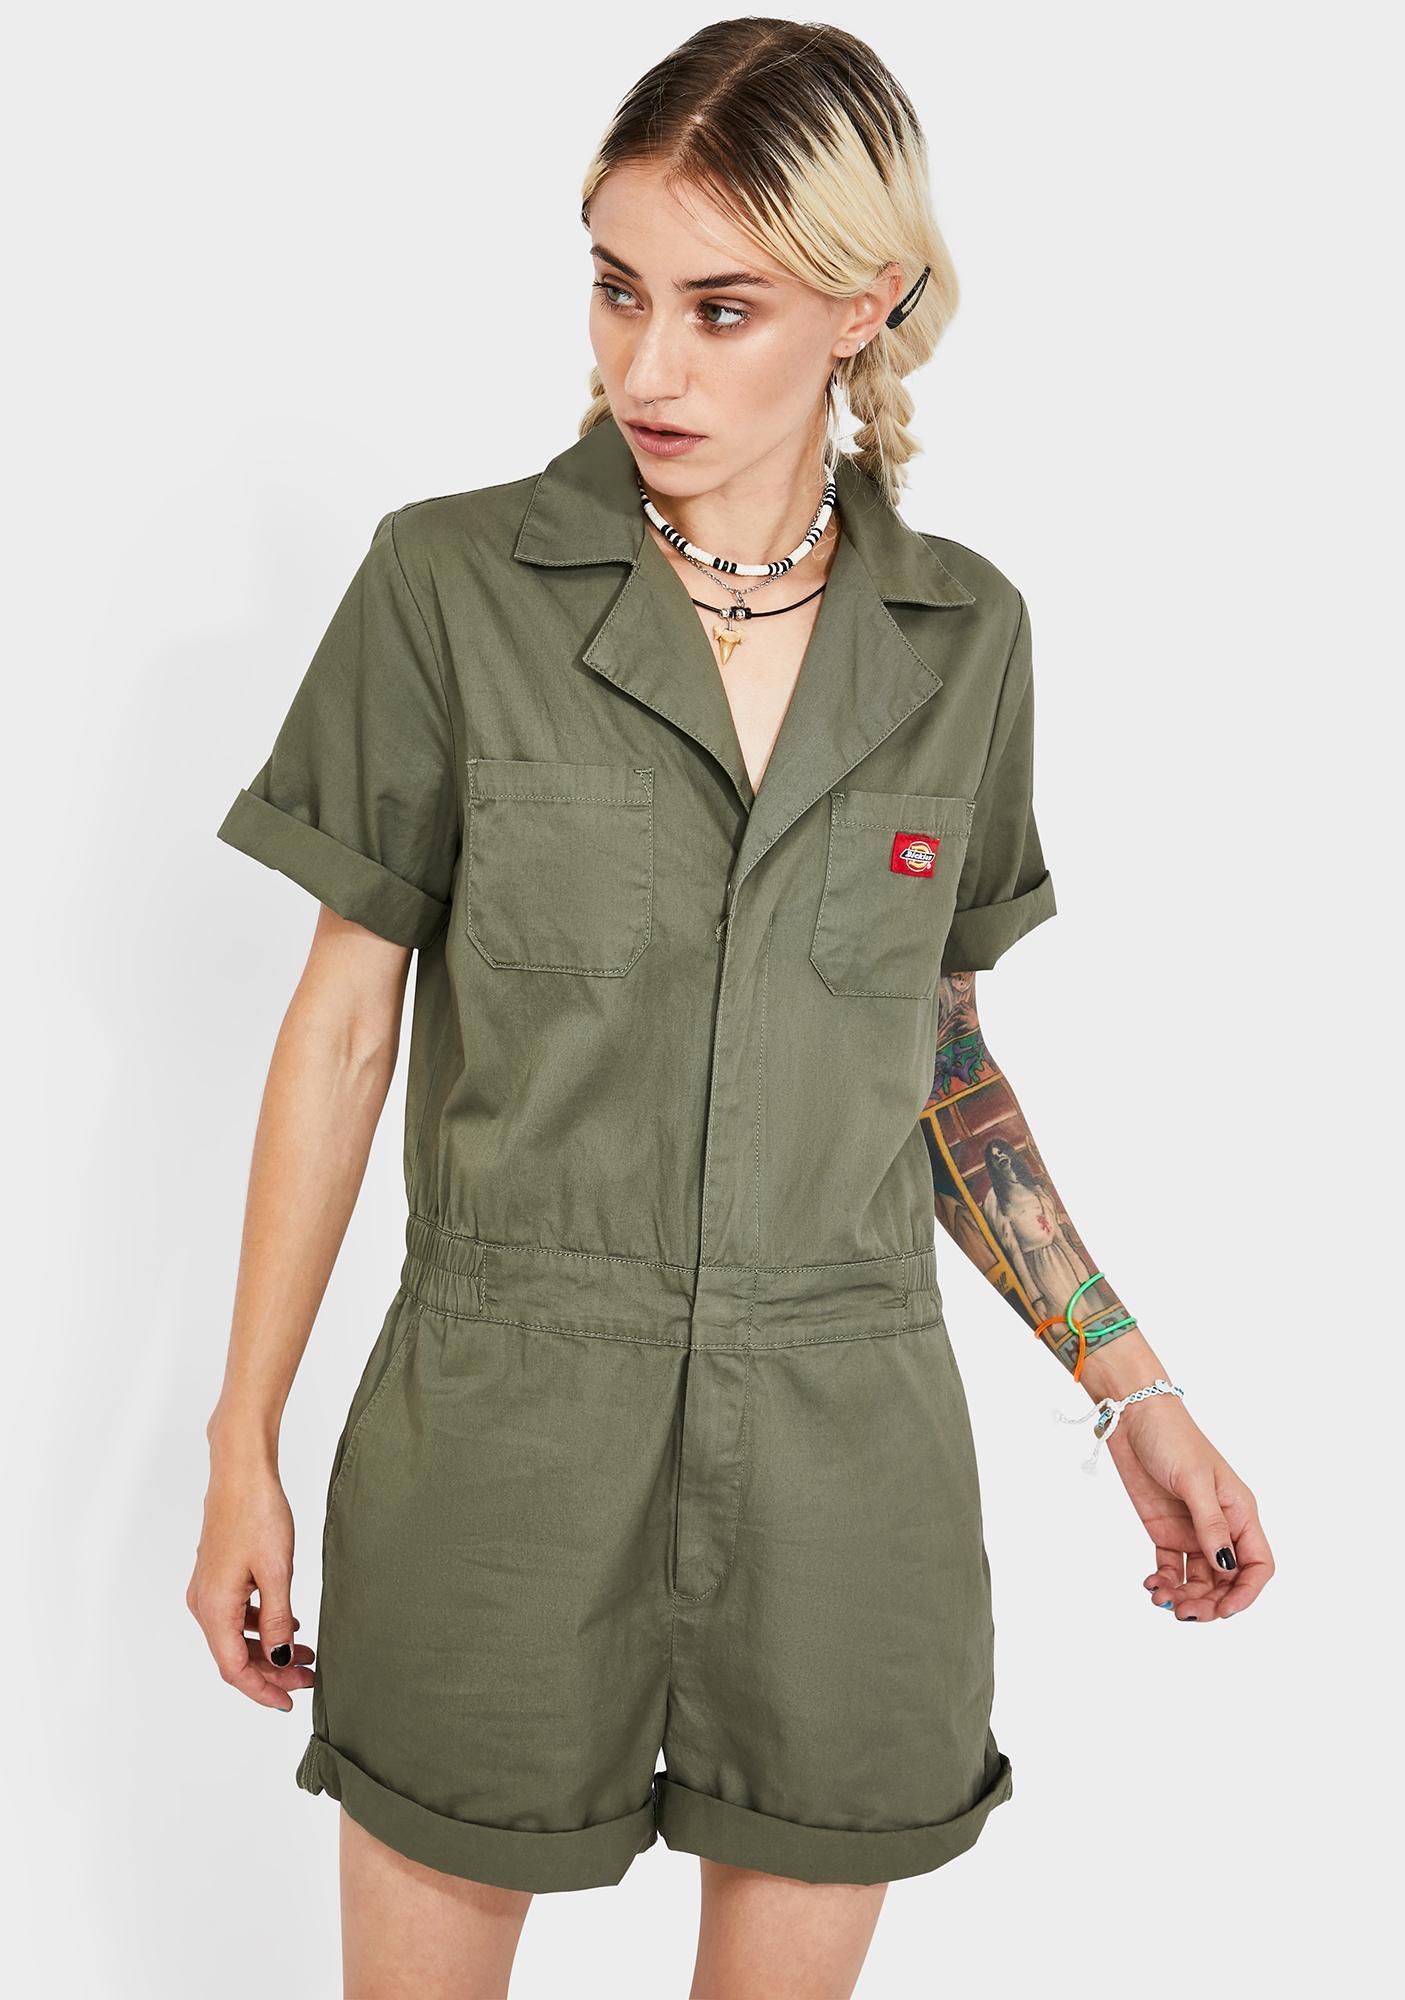 Dickies Girl Cuffed Short Sleeve Shortalls